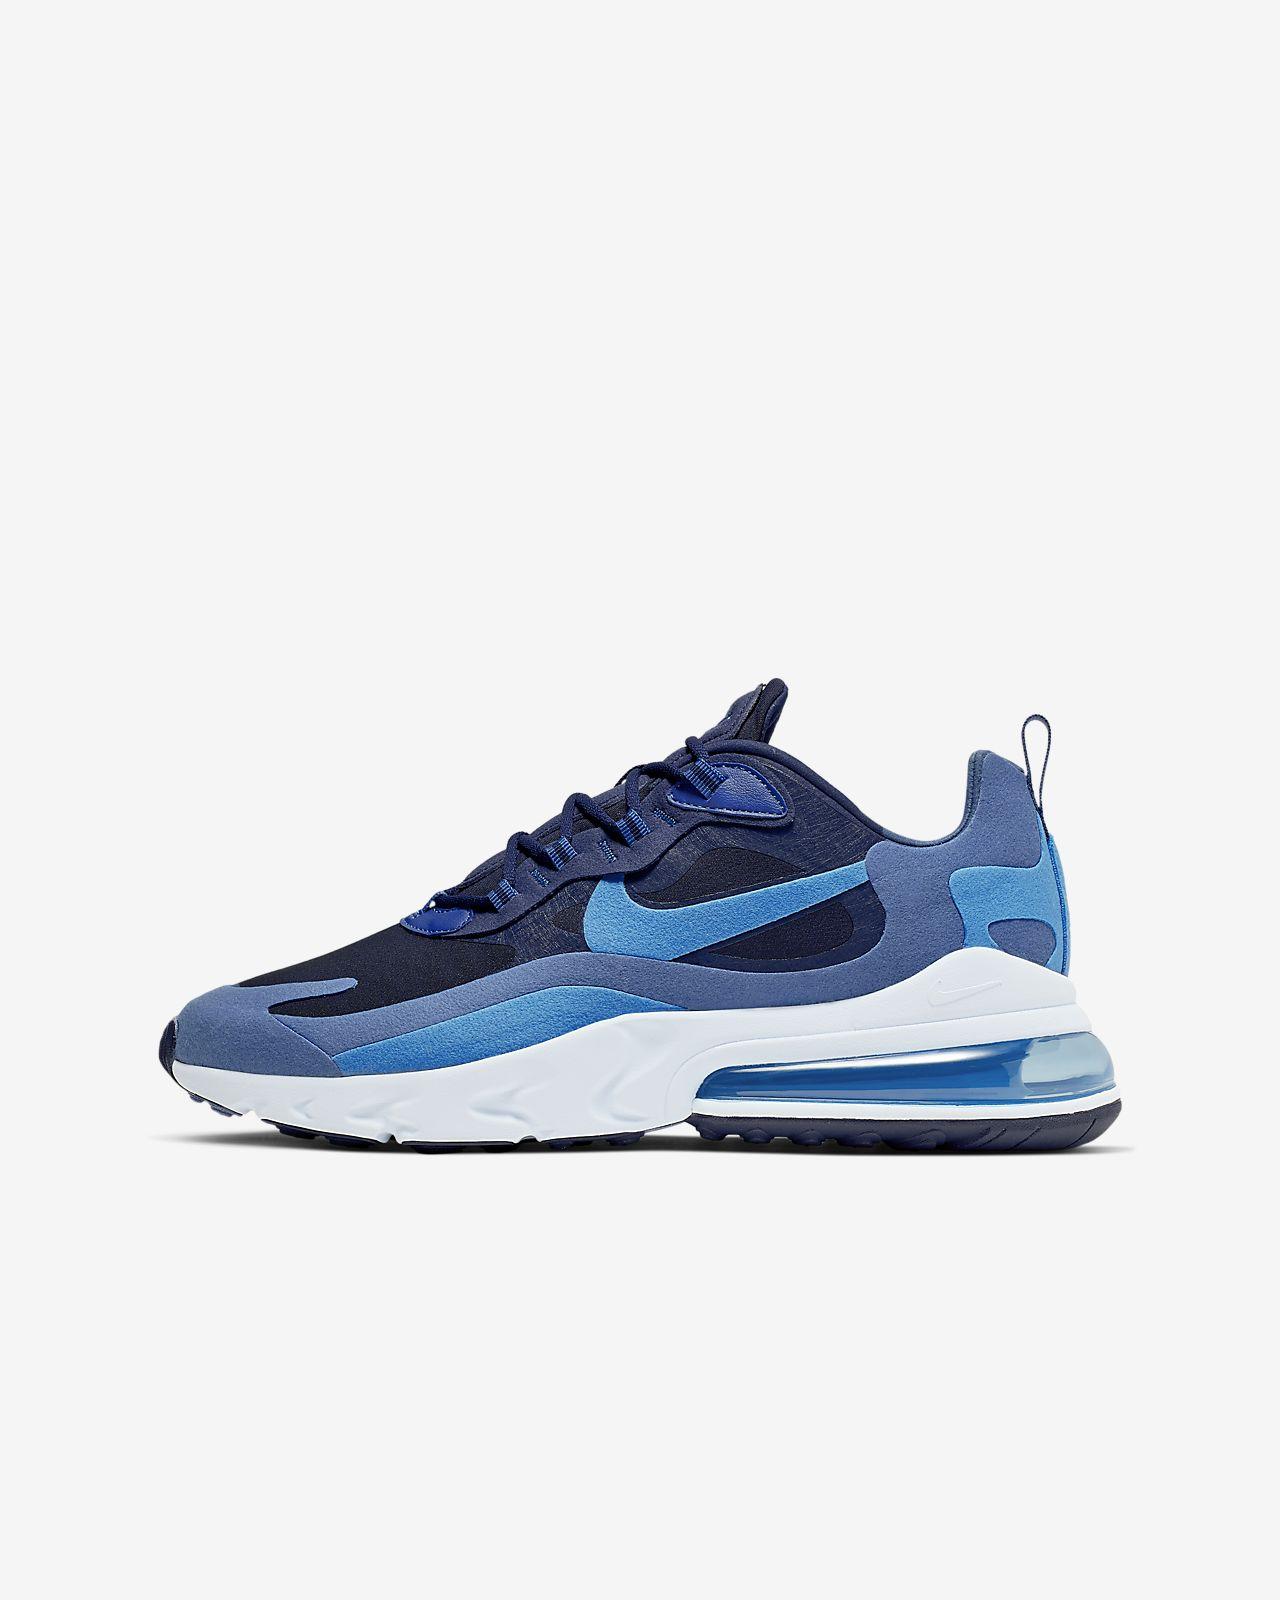 Nike Air Max 270 React (Impressionism Art)-sko til mænd